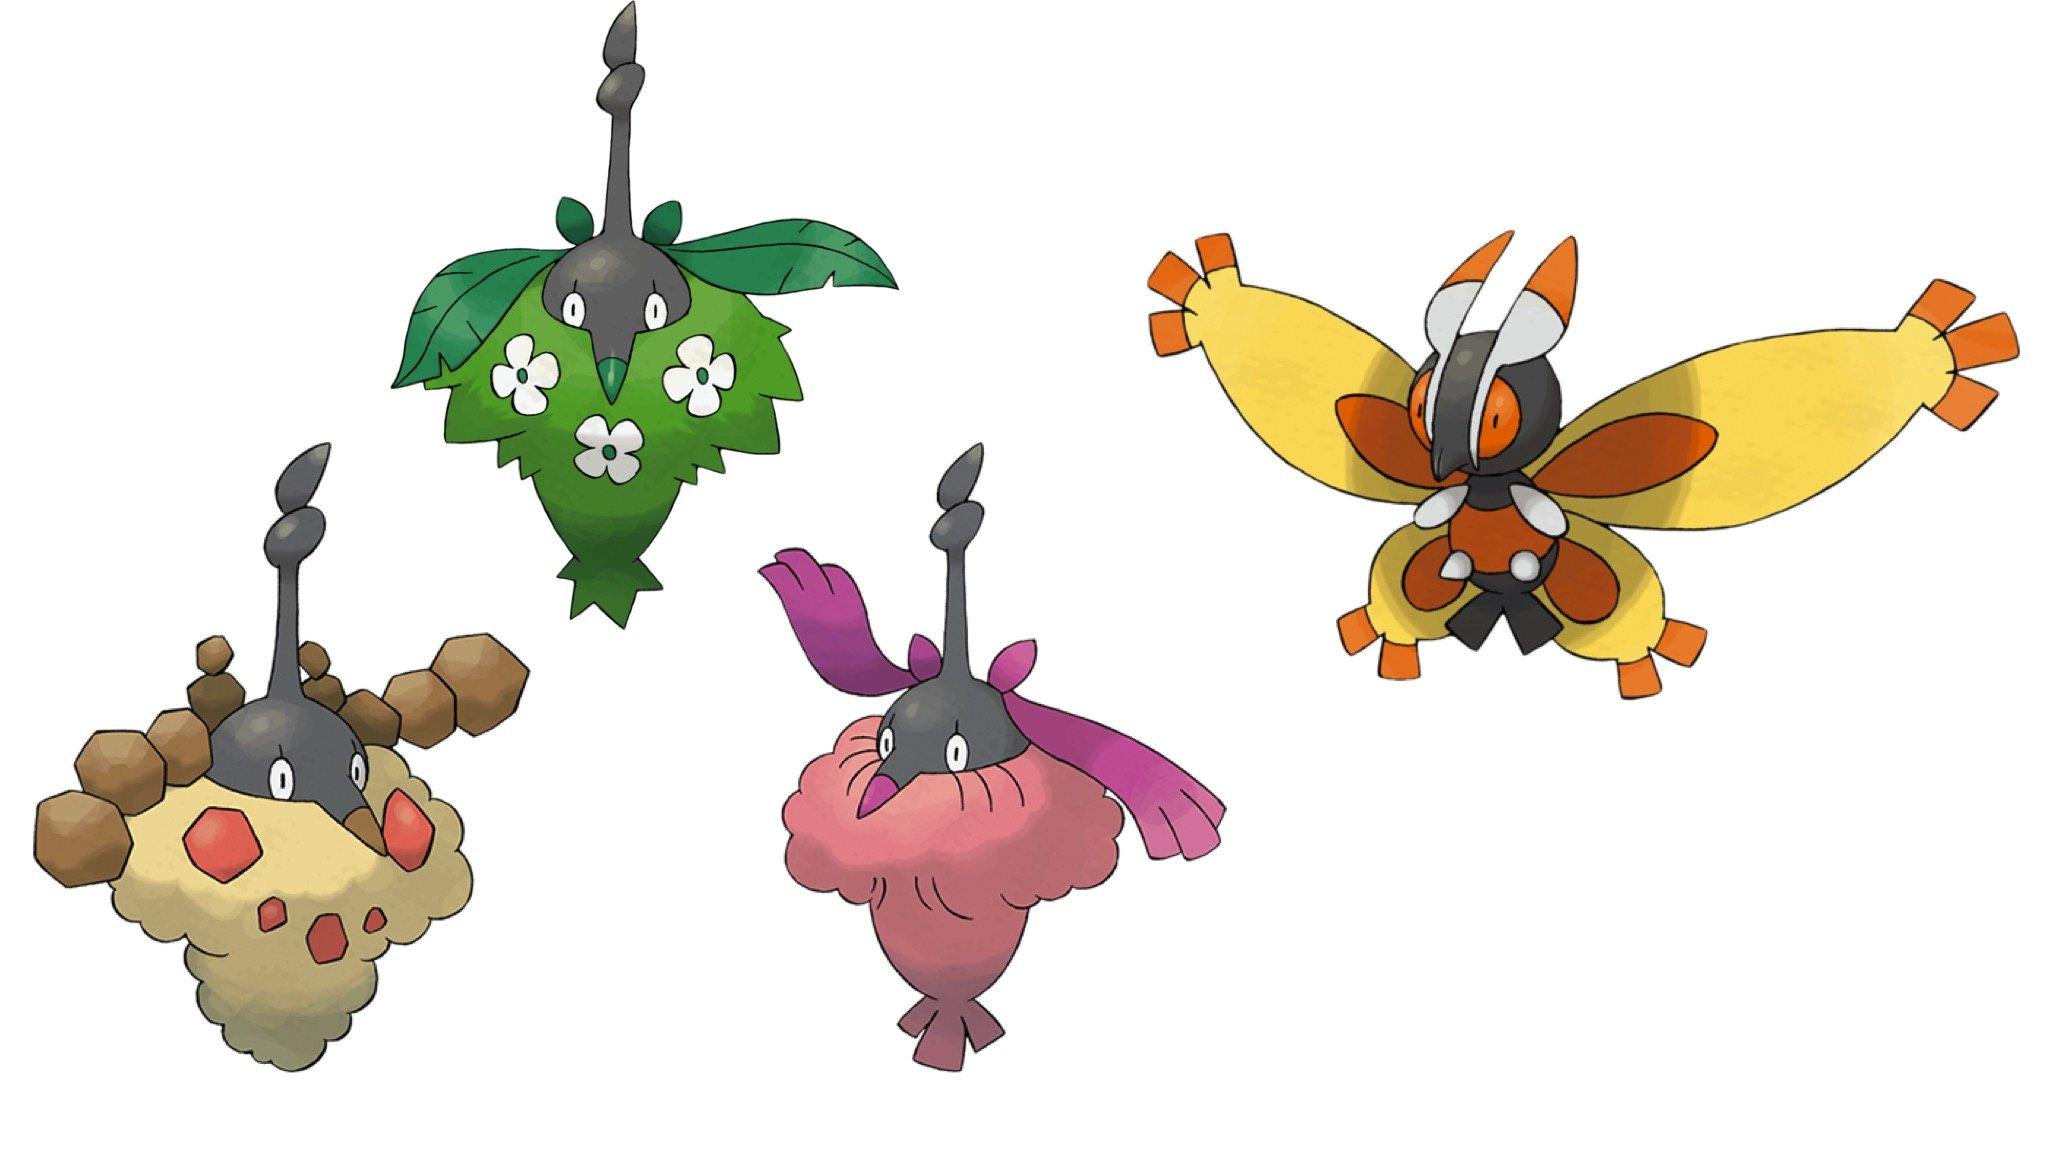 Burmy In Pokémon GO - Where To Find Plant, Sandy And Trash